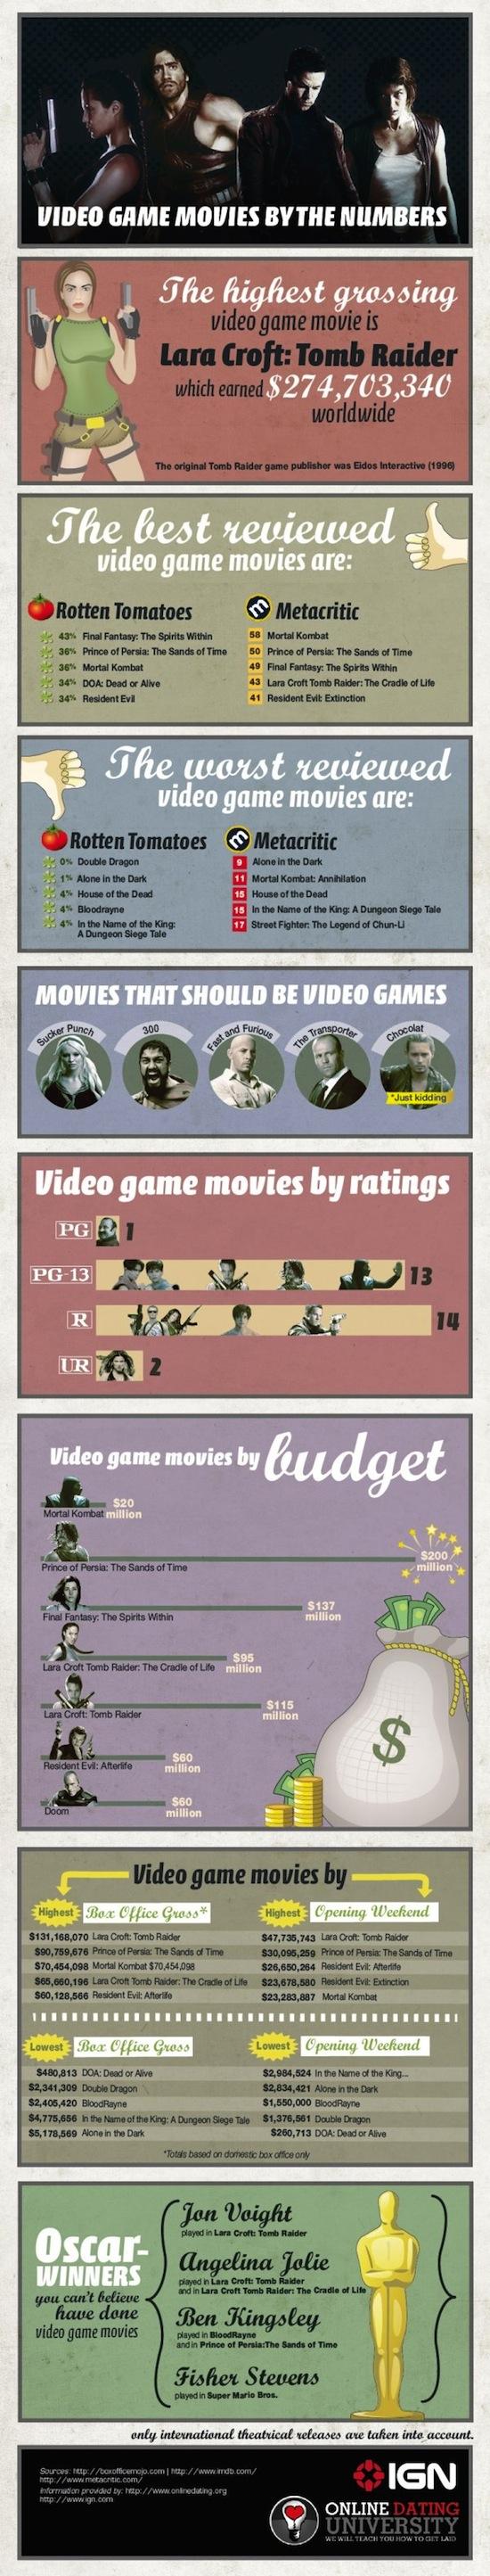 Videojuegos de Película [Infografía] - Video-Game-Movies-Post